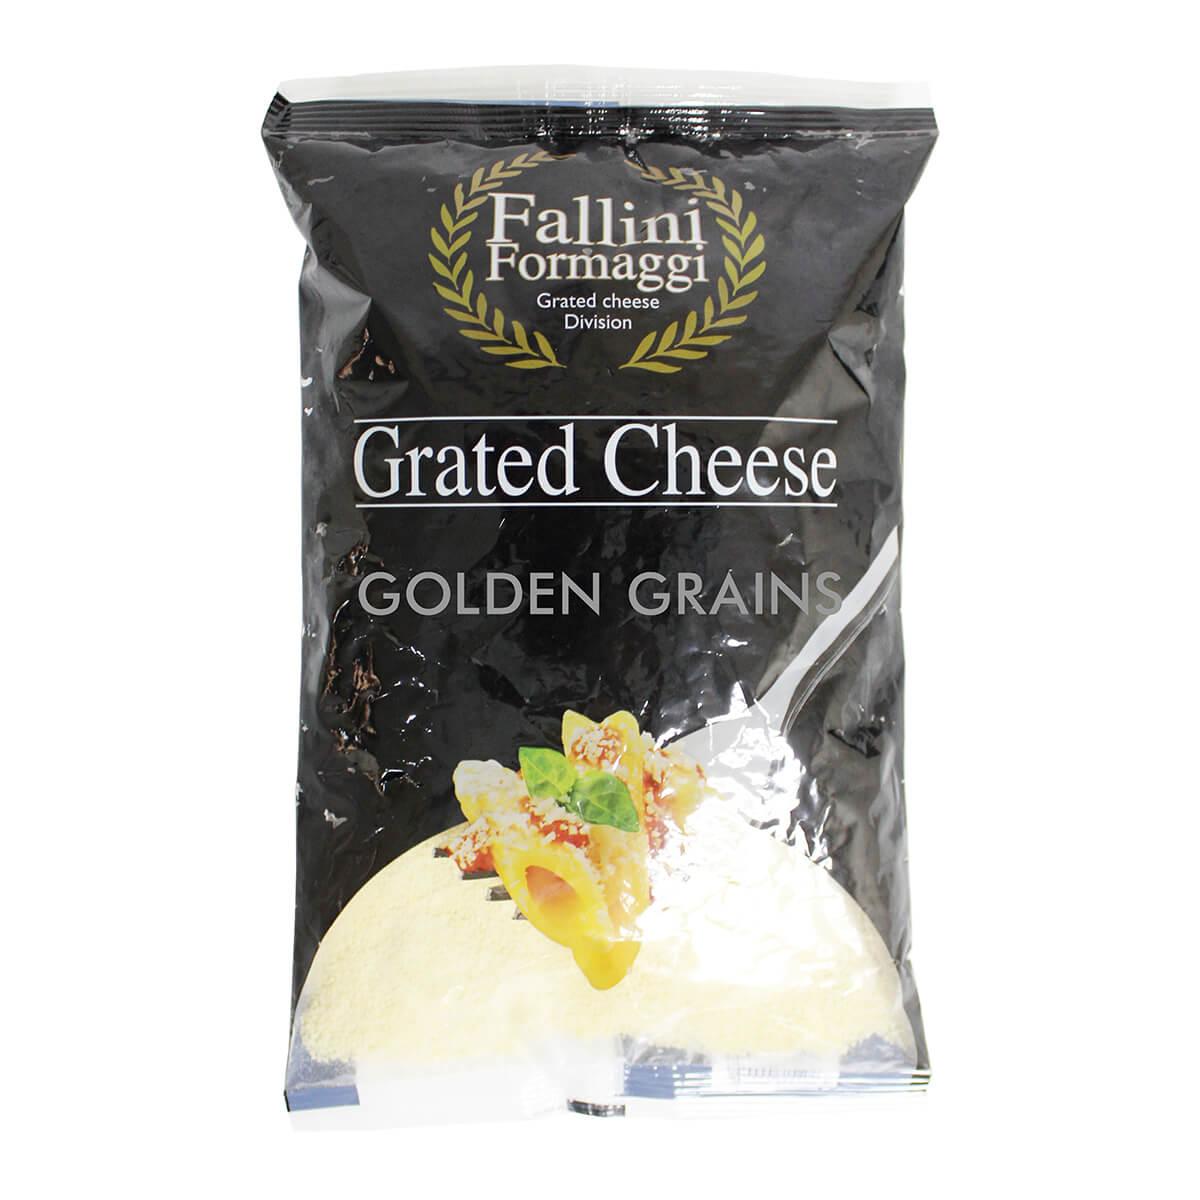 Golden Grains Dubai Export - Fallini - Front.jpg